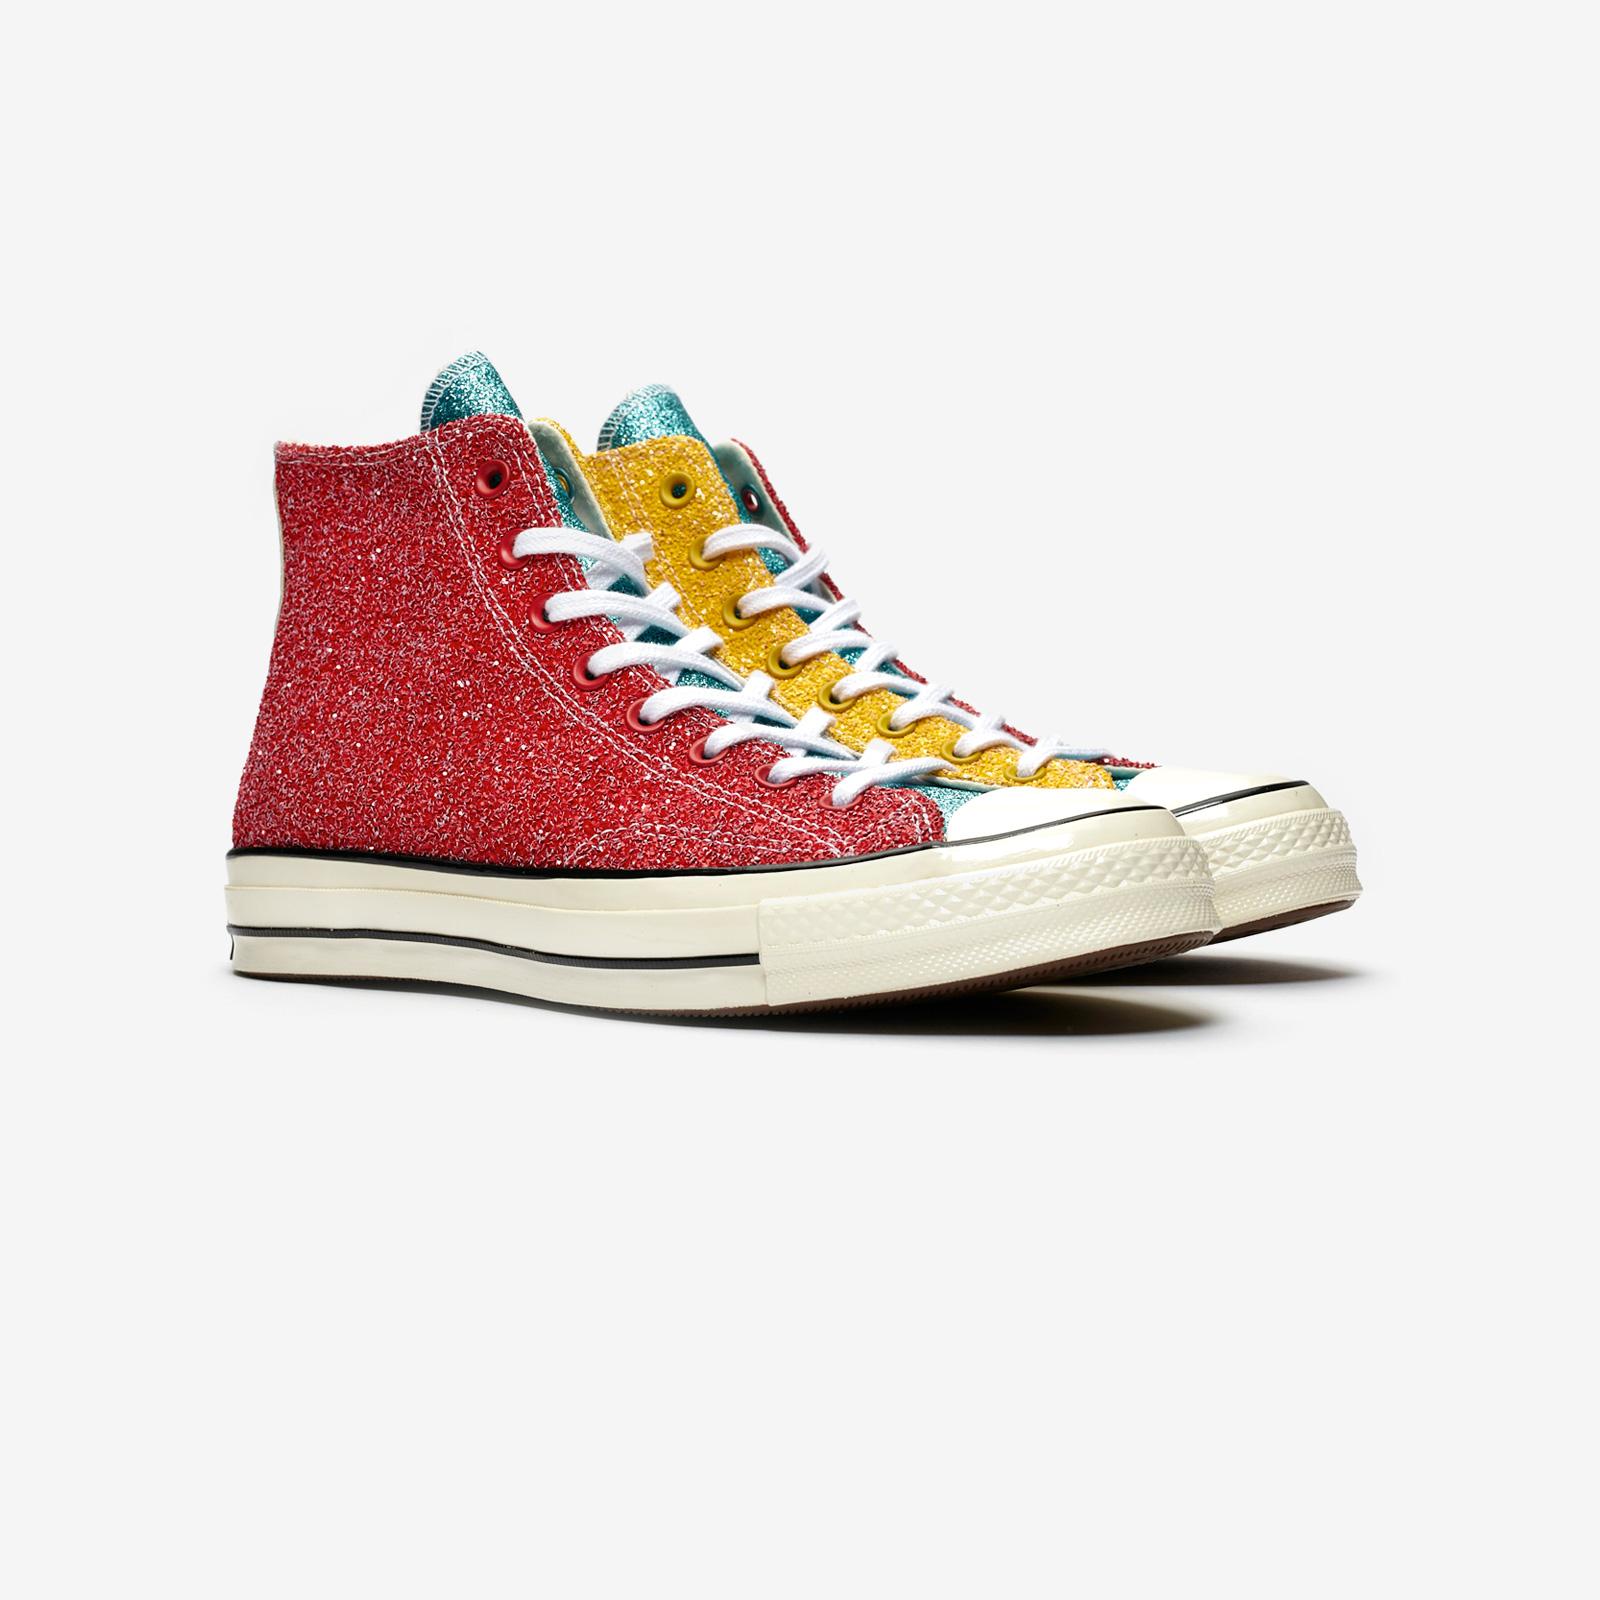 451f57eb9a0 Converse Chuck 70 Hi x JW Anderson - 164694c - Sneakersnstuff   sneakers &  streetwear på nätet sen 1999